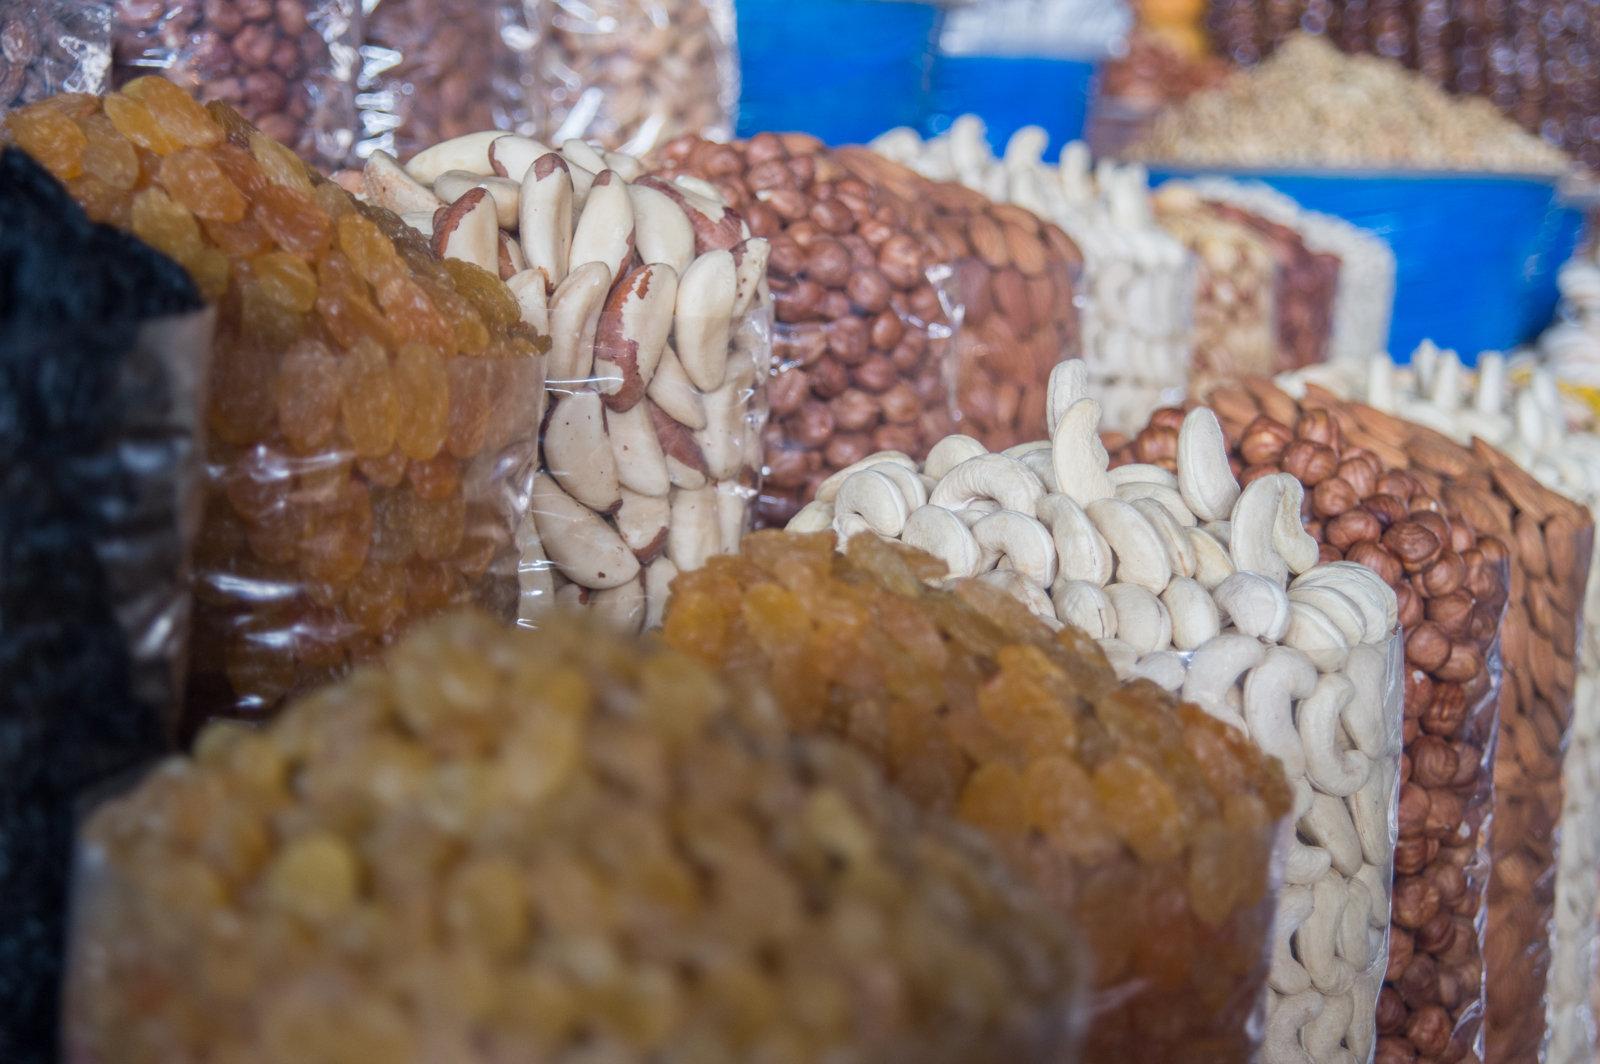 Орешки, фисташки, изюм, индийский орех, греческий орех, фундук